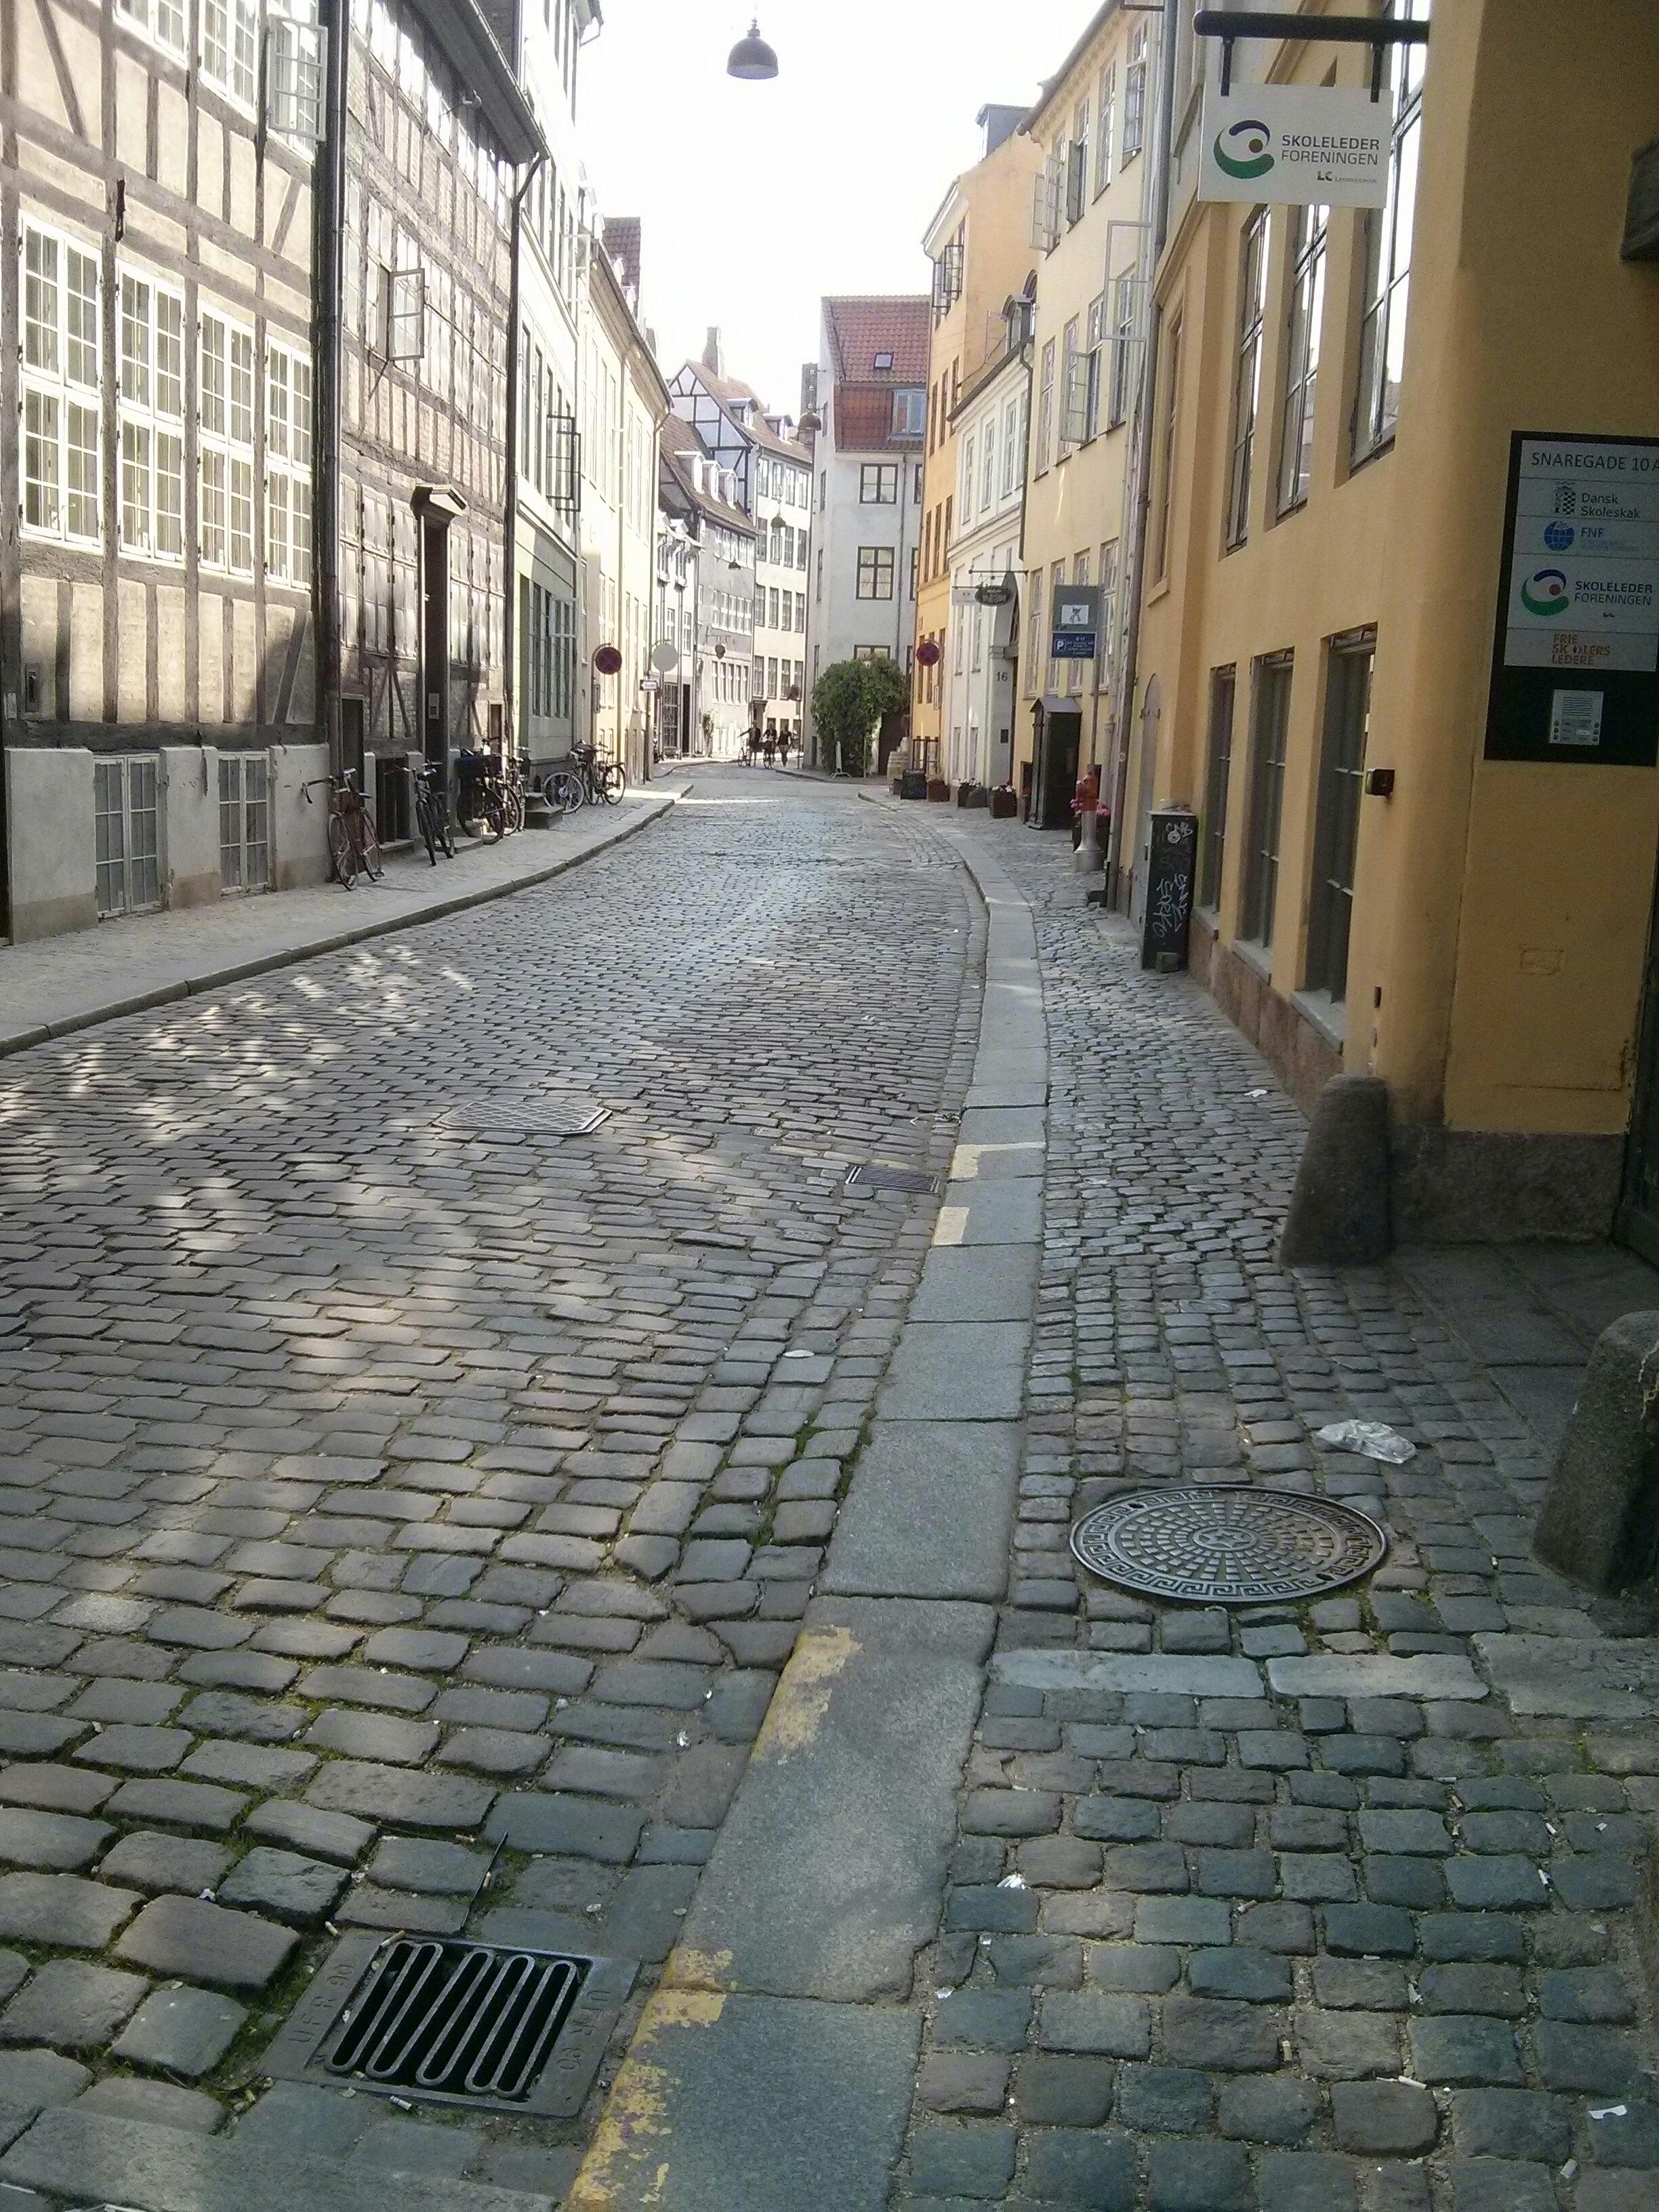 just a lovely pieceful street in the heart of copenhagen